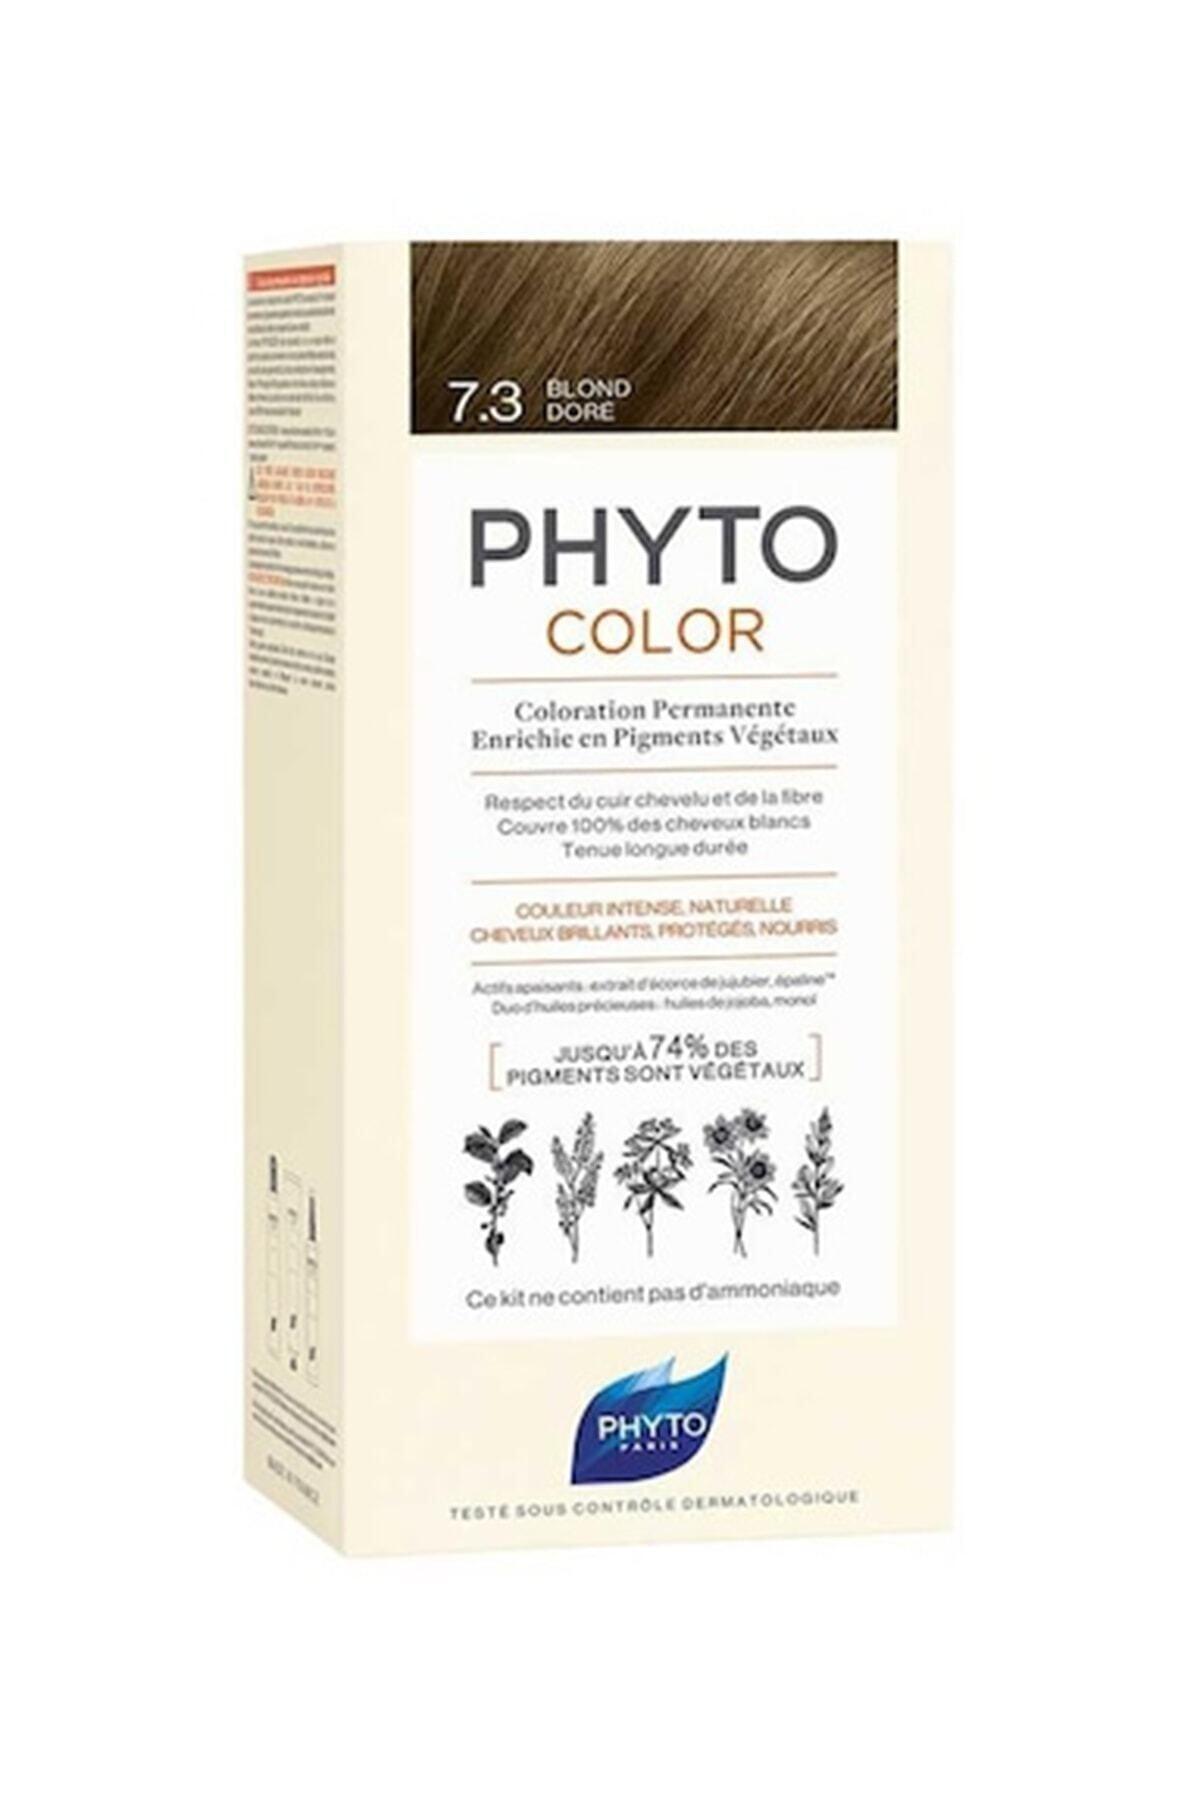 Phyto Color 7.3 - Kumral Dore (Bitkisel Saç Boyası) - 1